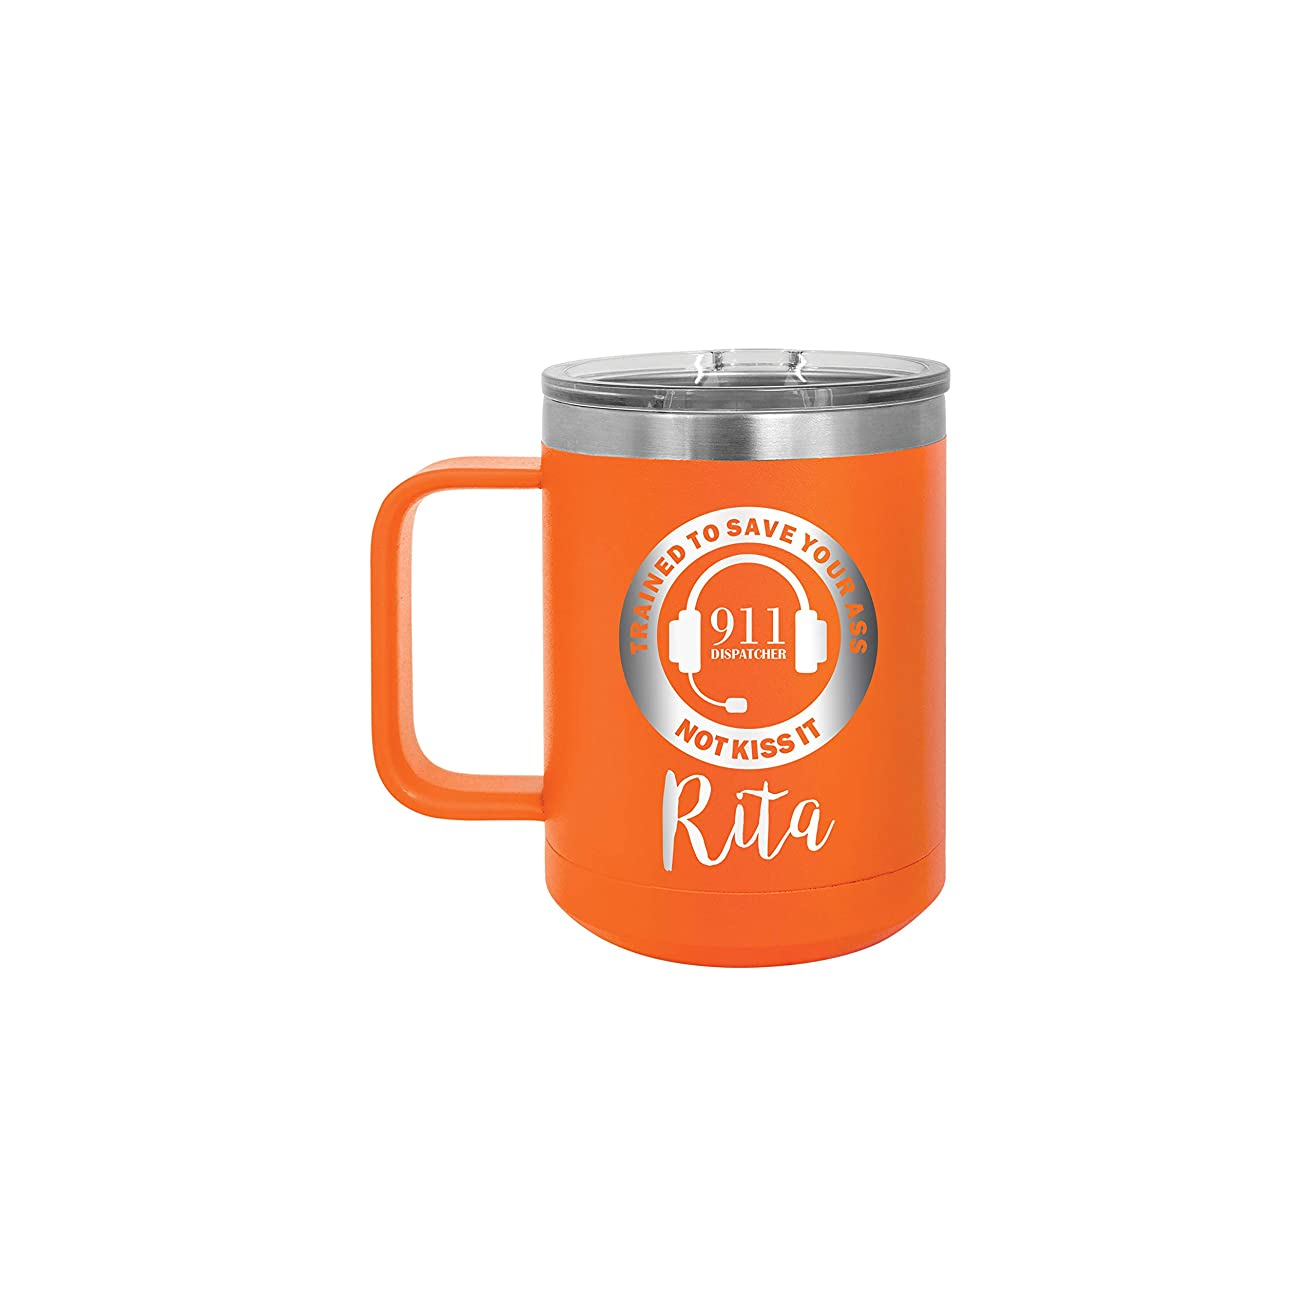 911 Dispatcher Telecommunications Personalized 15 oz Insulated Coffee Mug